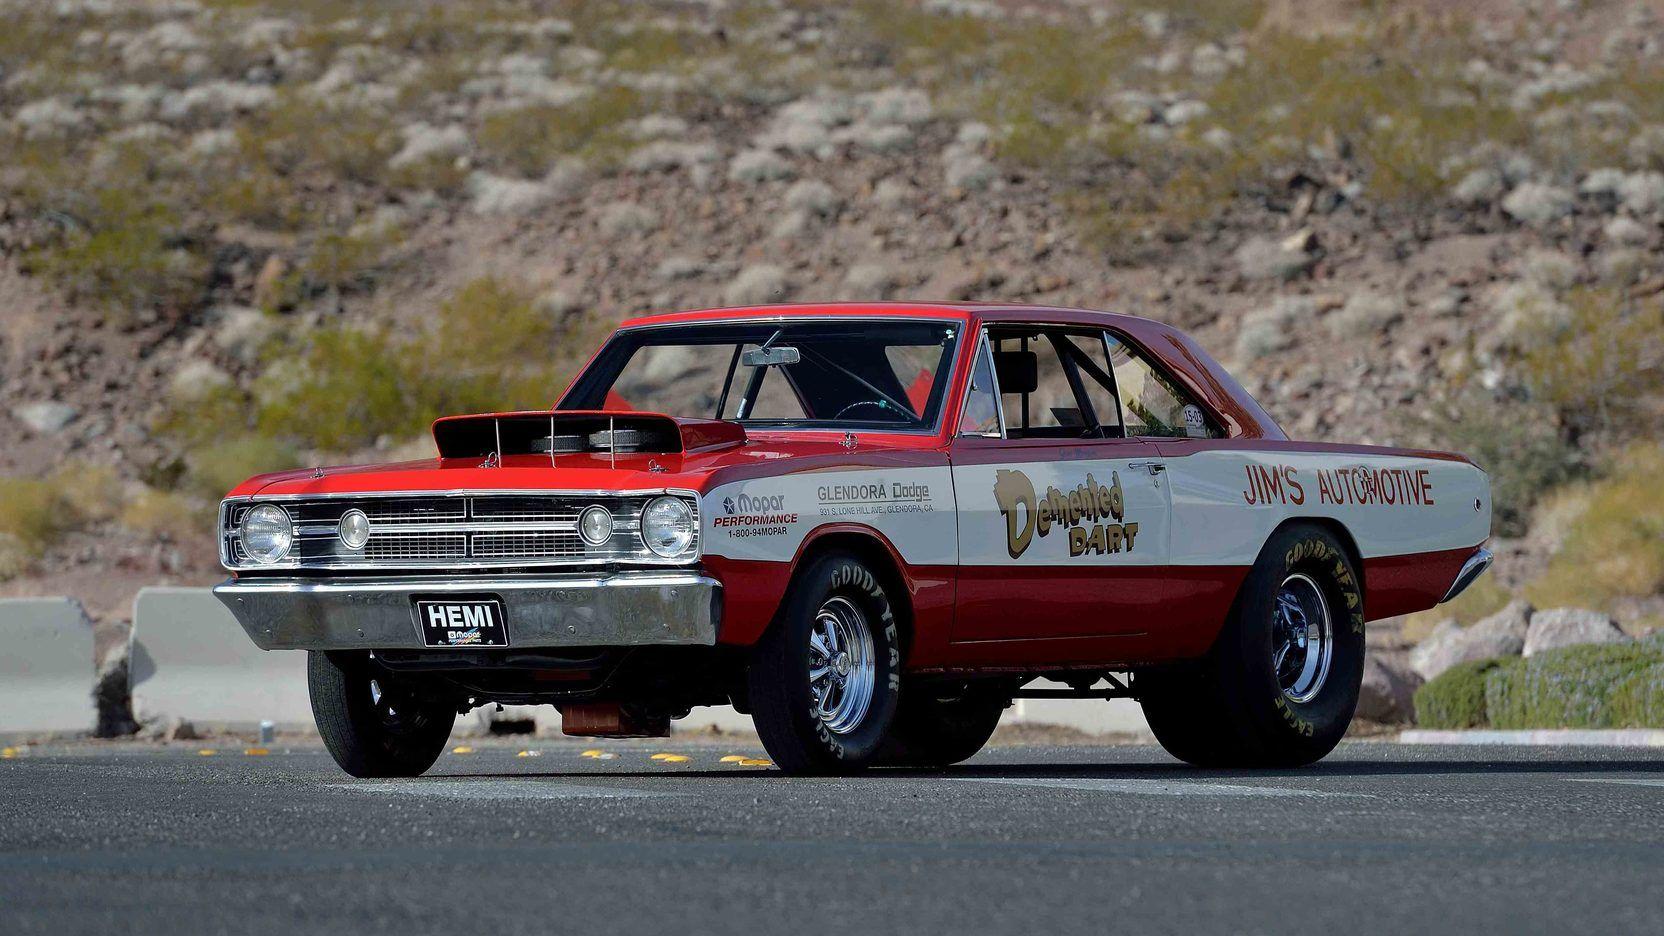 Lot S130 1968 Dodge Hemi Dart Lo23 Super Stock Dodge Hemi Dart